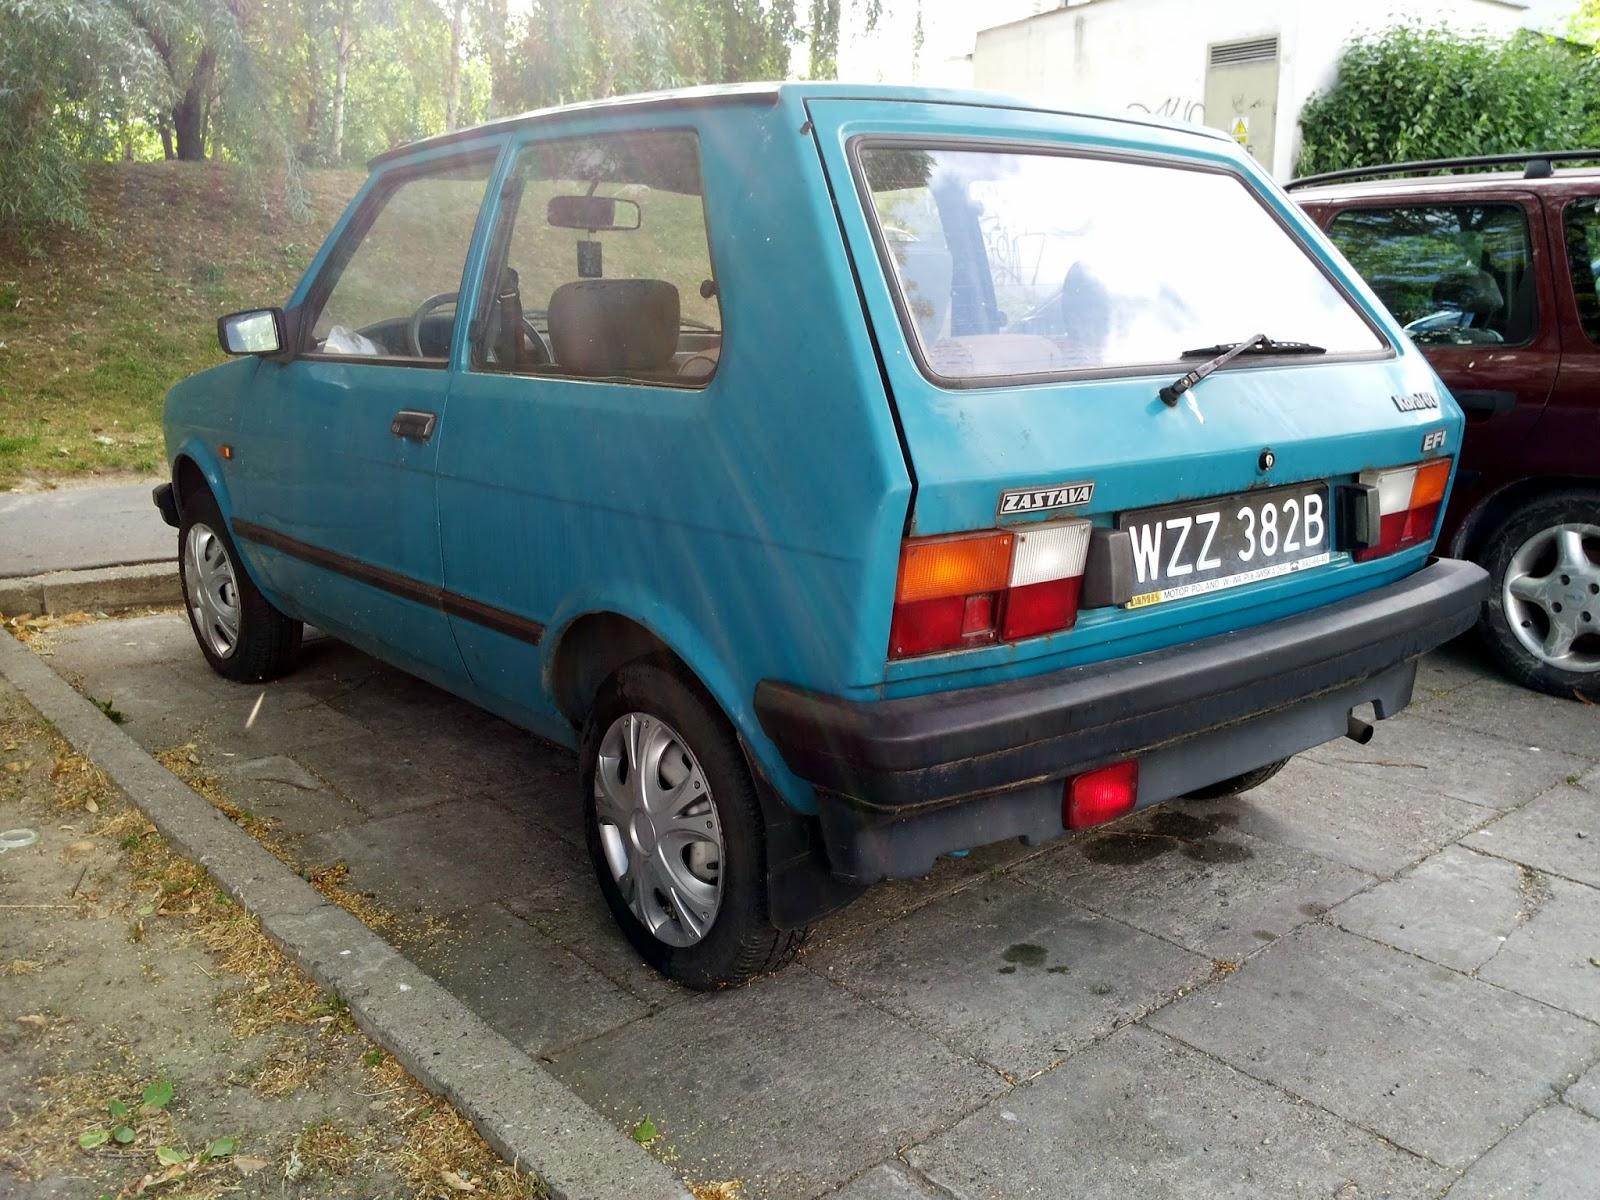 Warsaw Buick Gmc >> Yugo 60efi Pictures